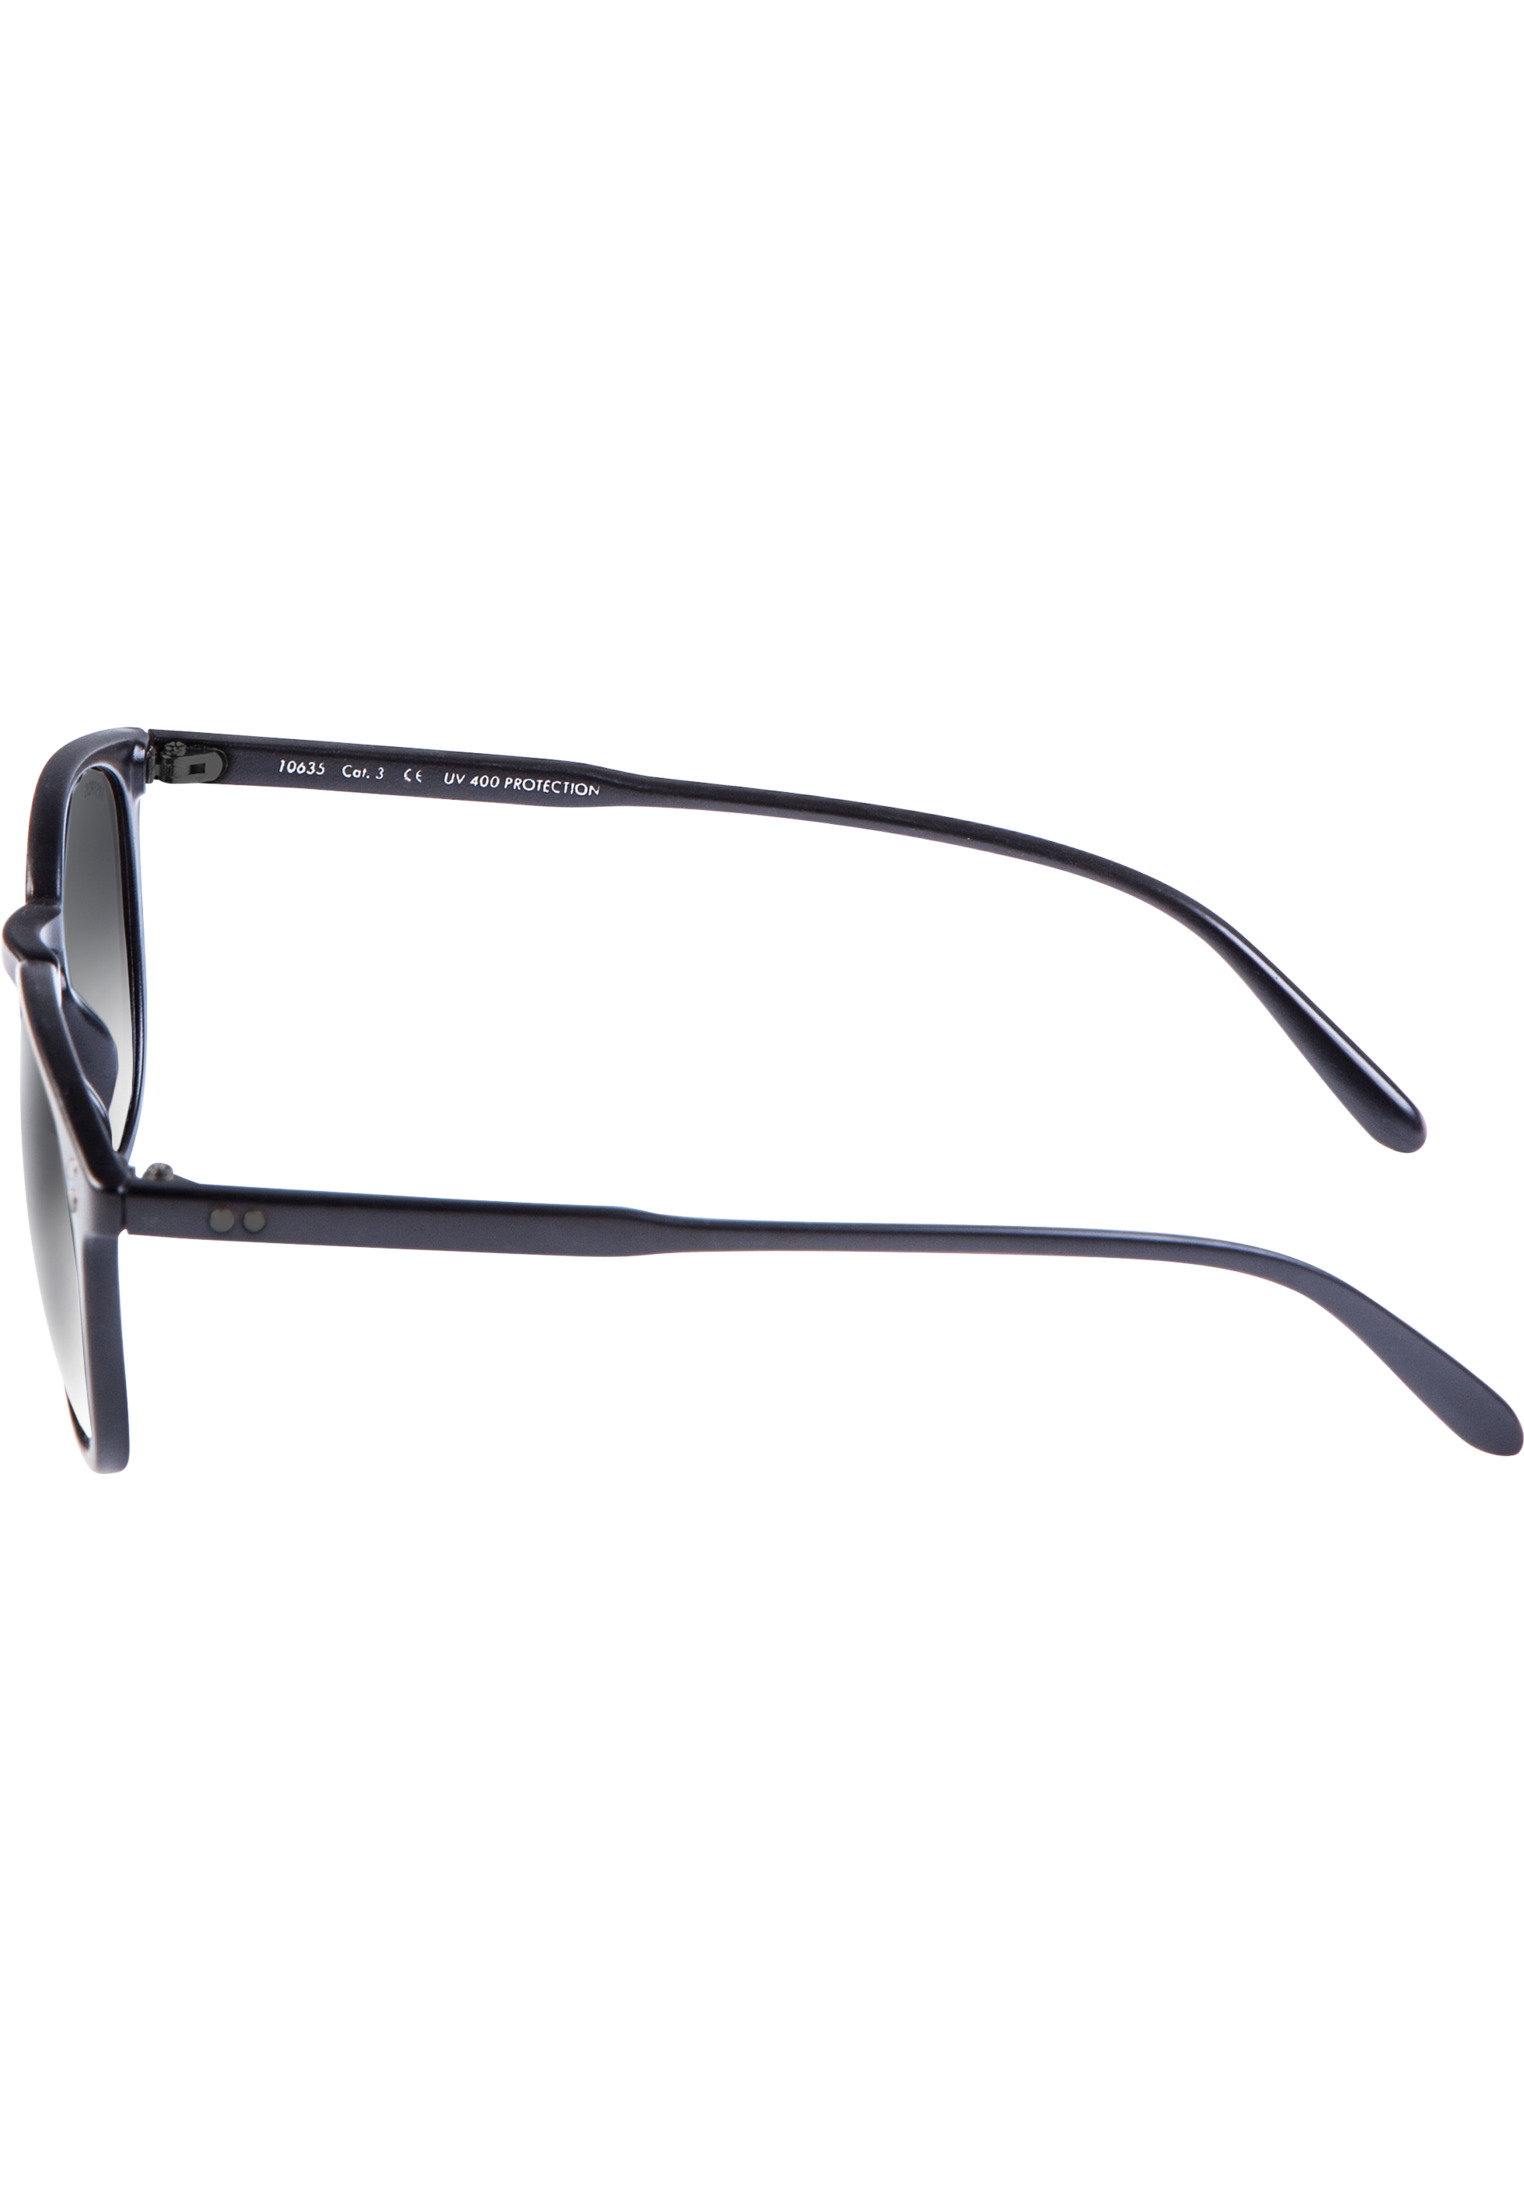 Urban Classics Sunglasses Arthur Youth havanna/rosé b0bOfp